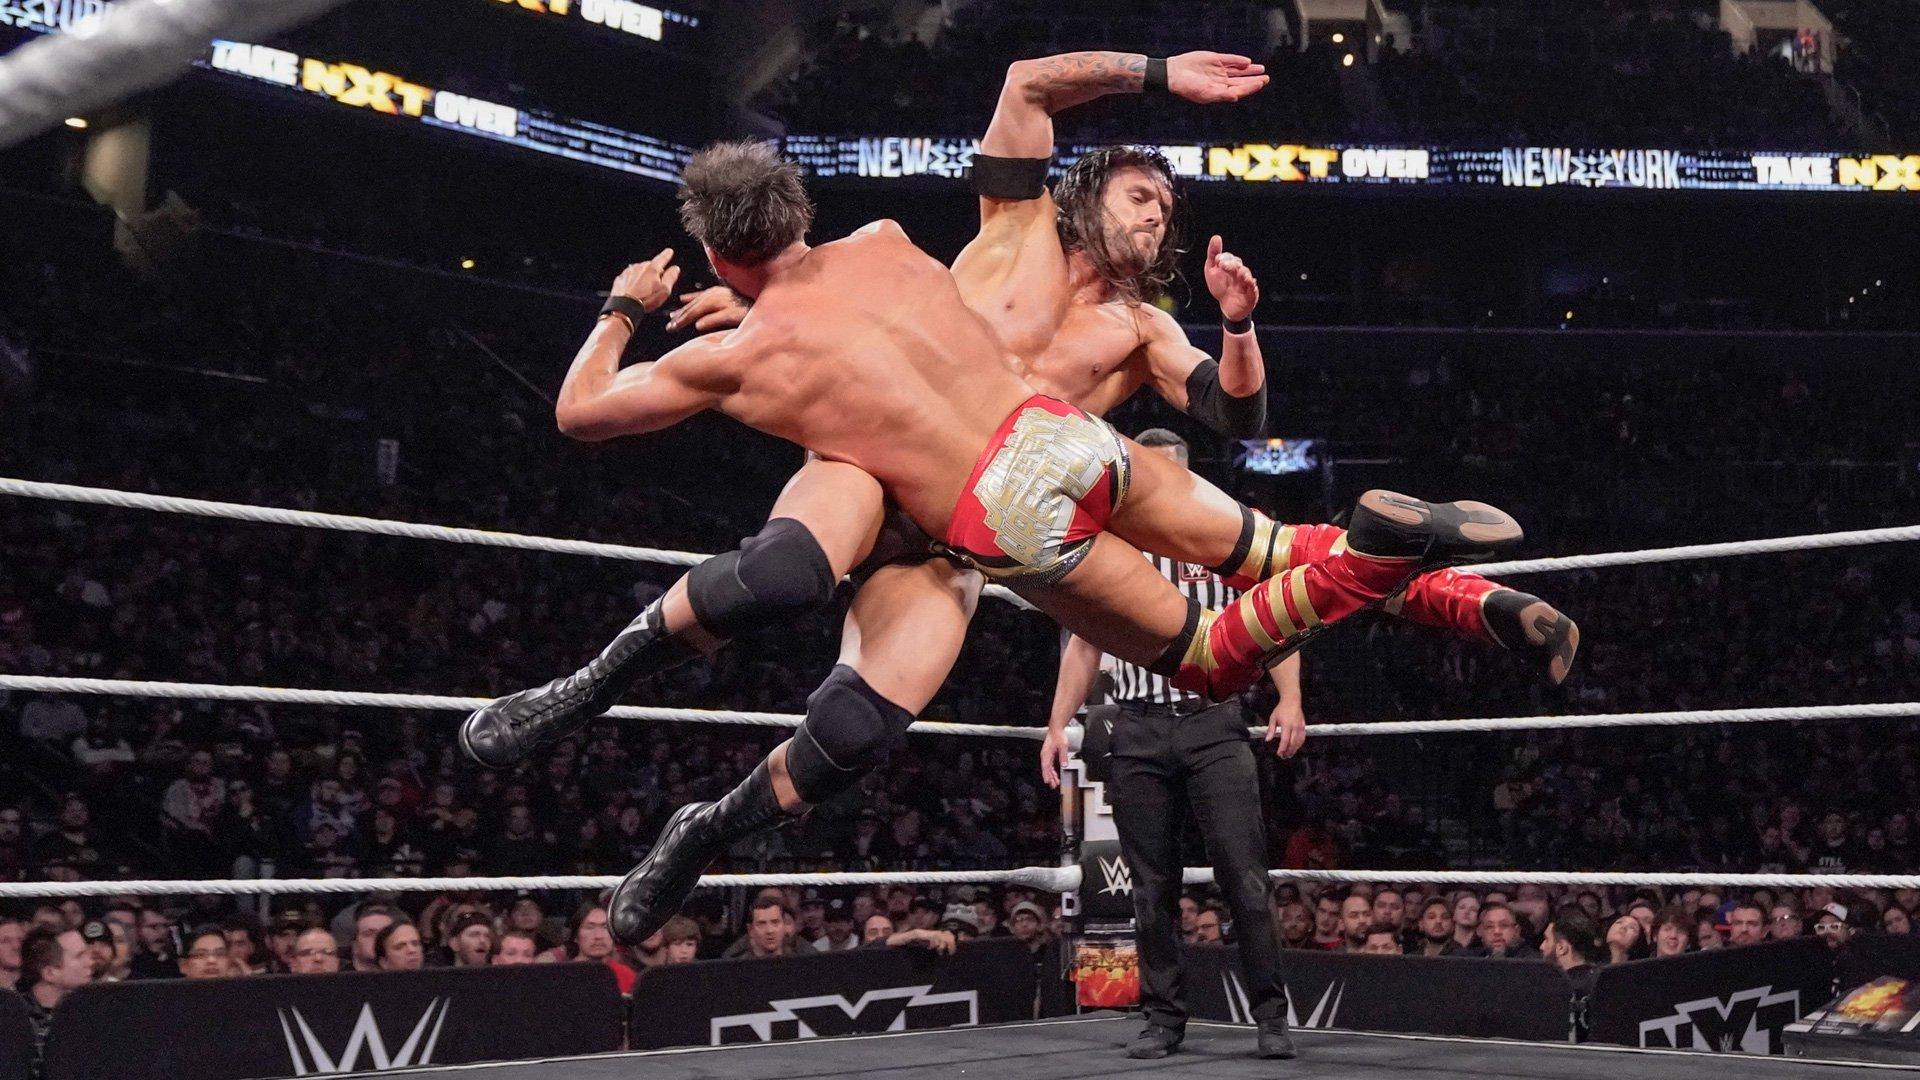 Johnny Gargano vs. Adam Cole - NXT Championship 2-out-of-3 Falls Match: photos